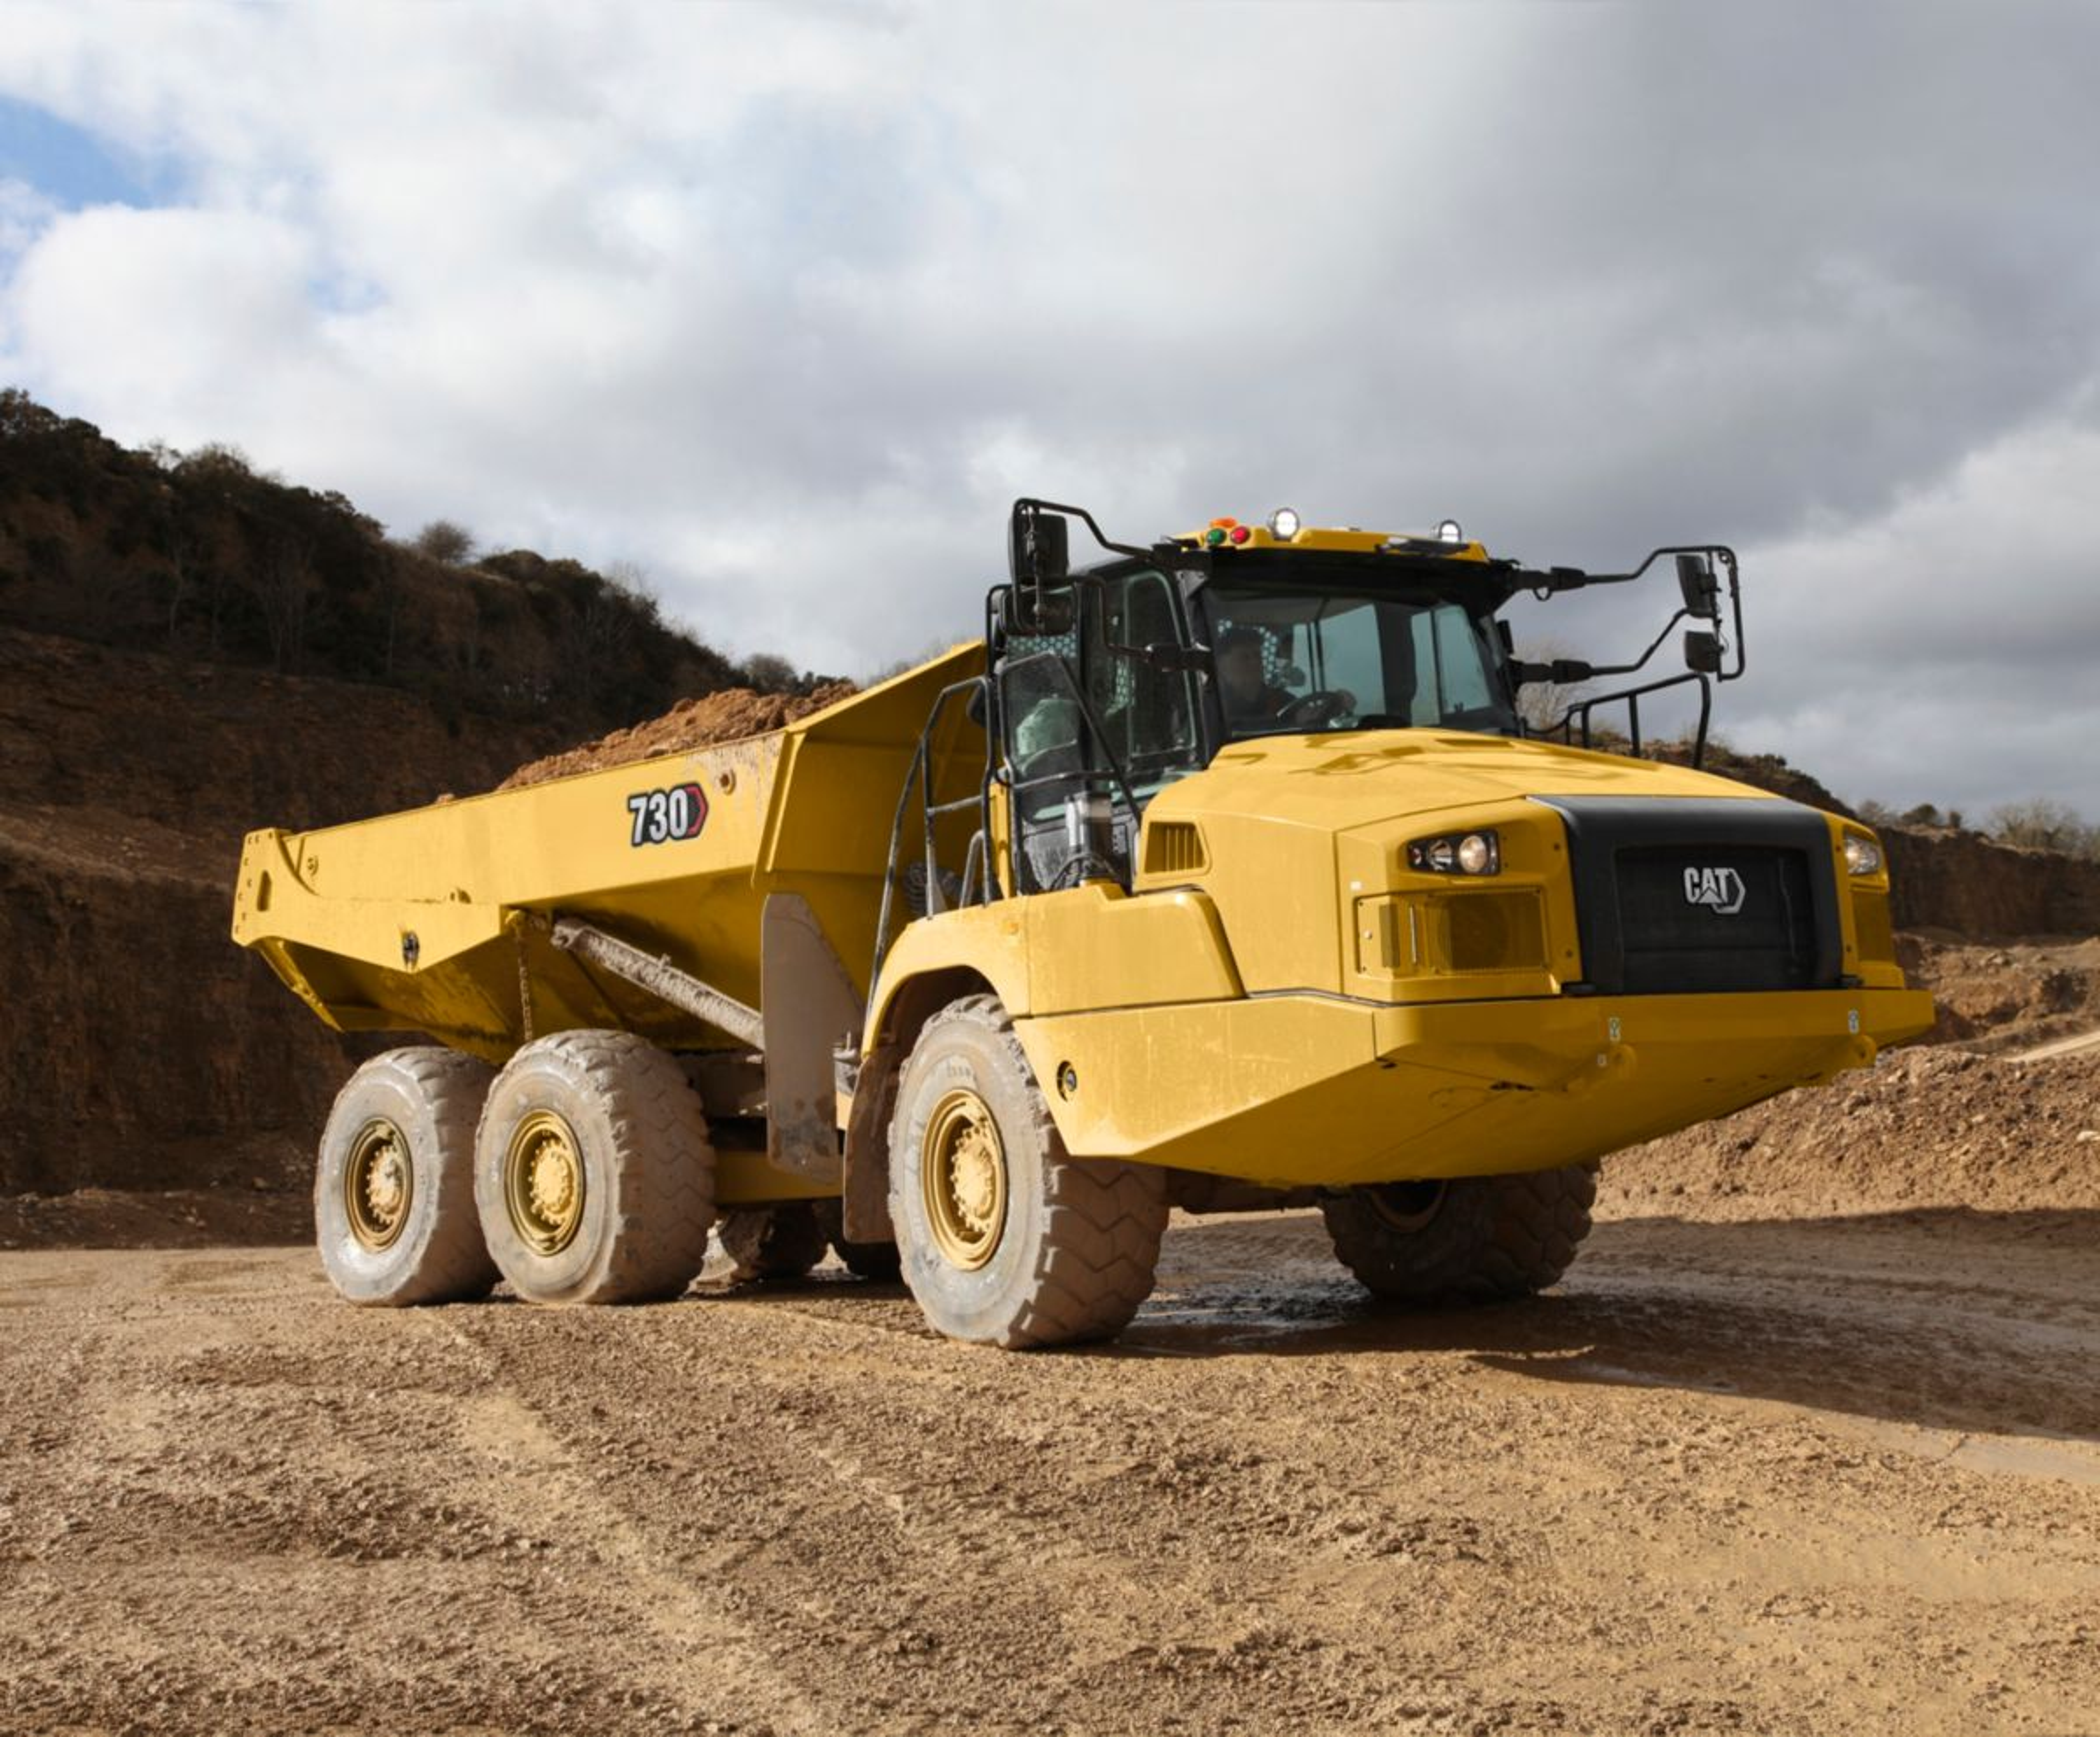 730 Articulated Haul Truck Cat Caterpillar